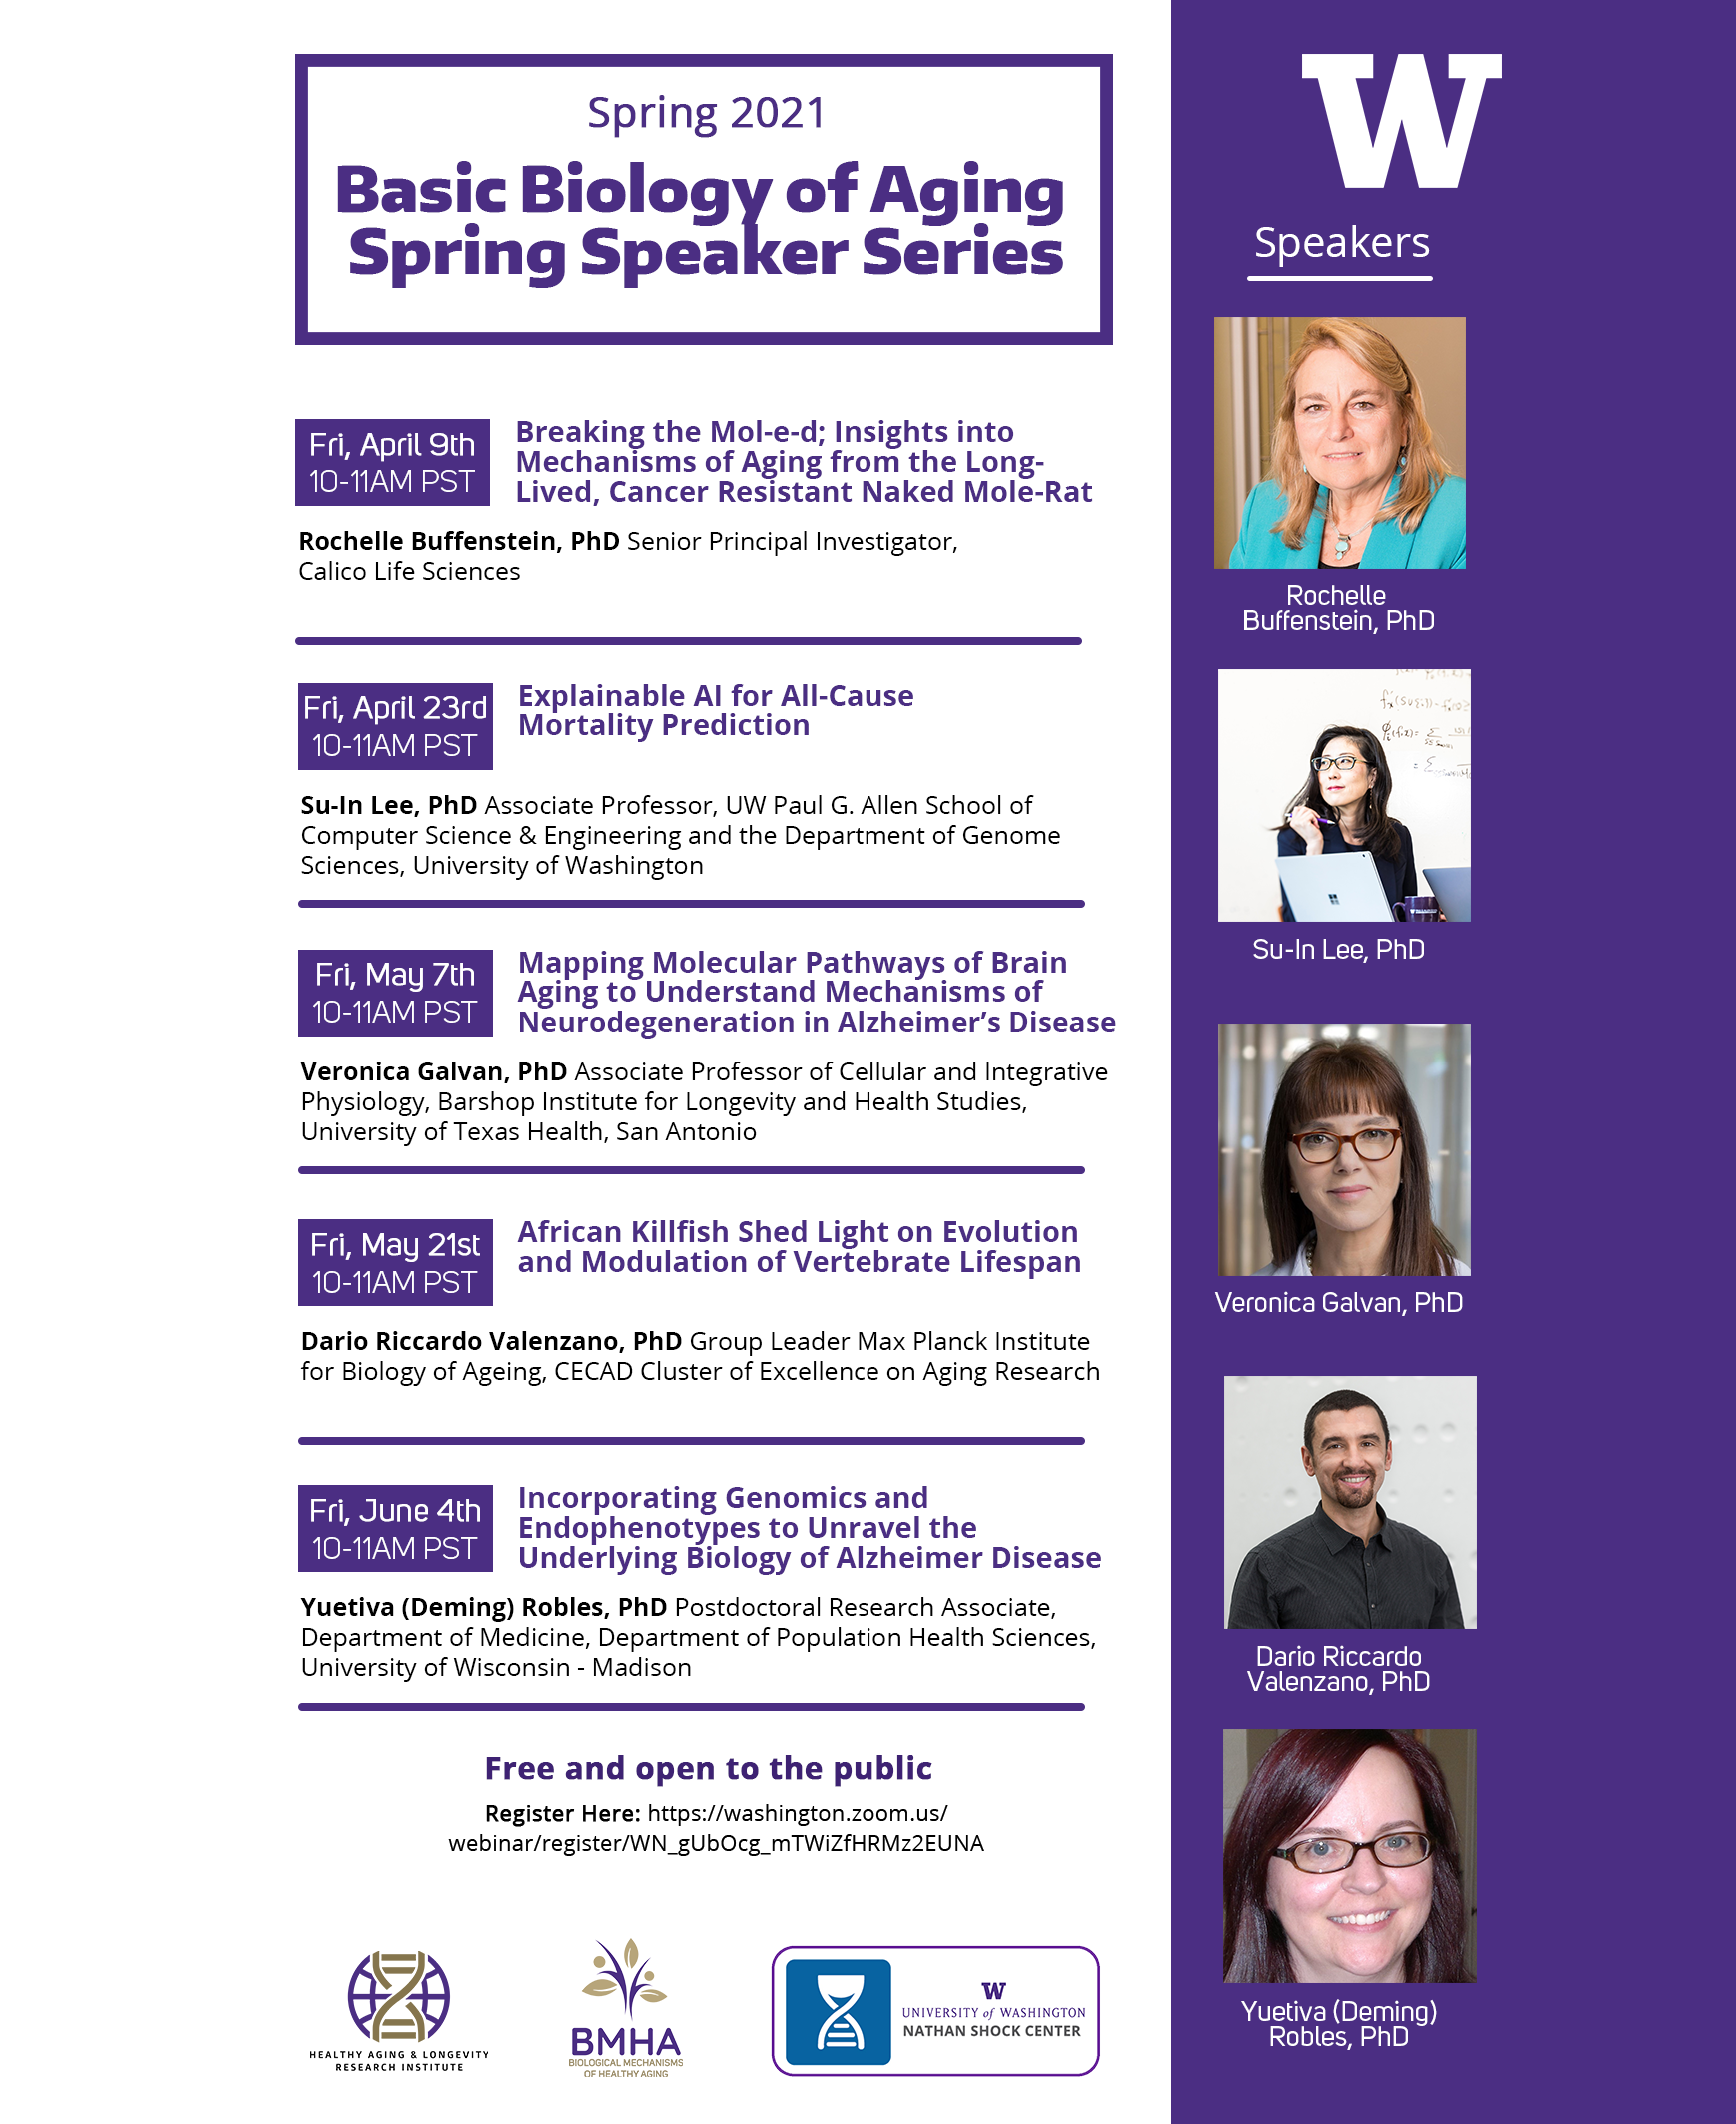 Basic Biology of Aging Spring Speaker Series